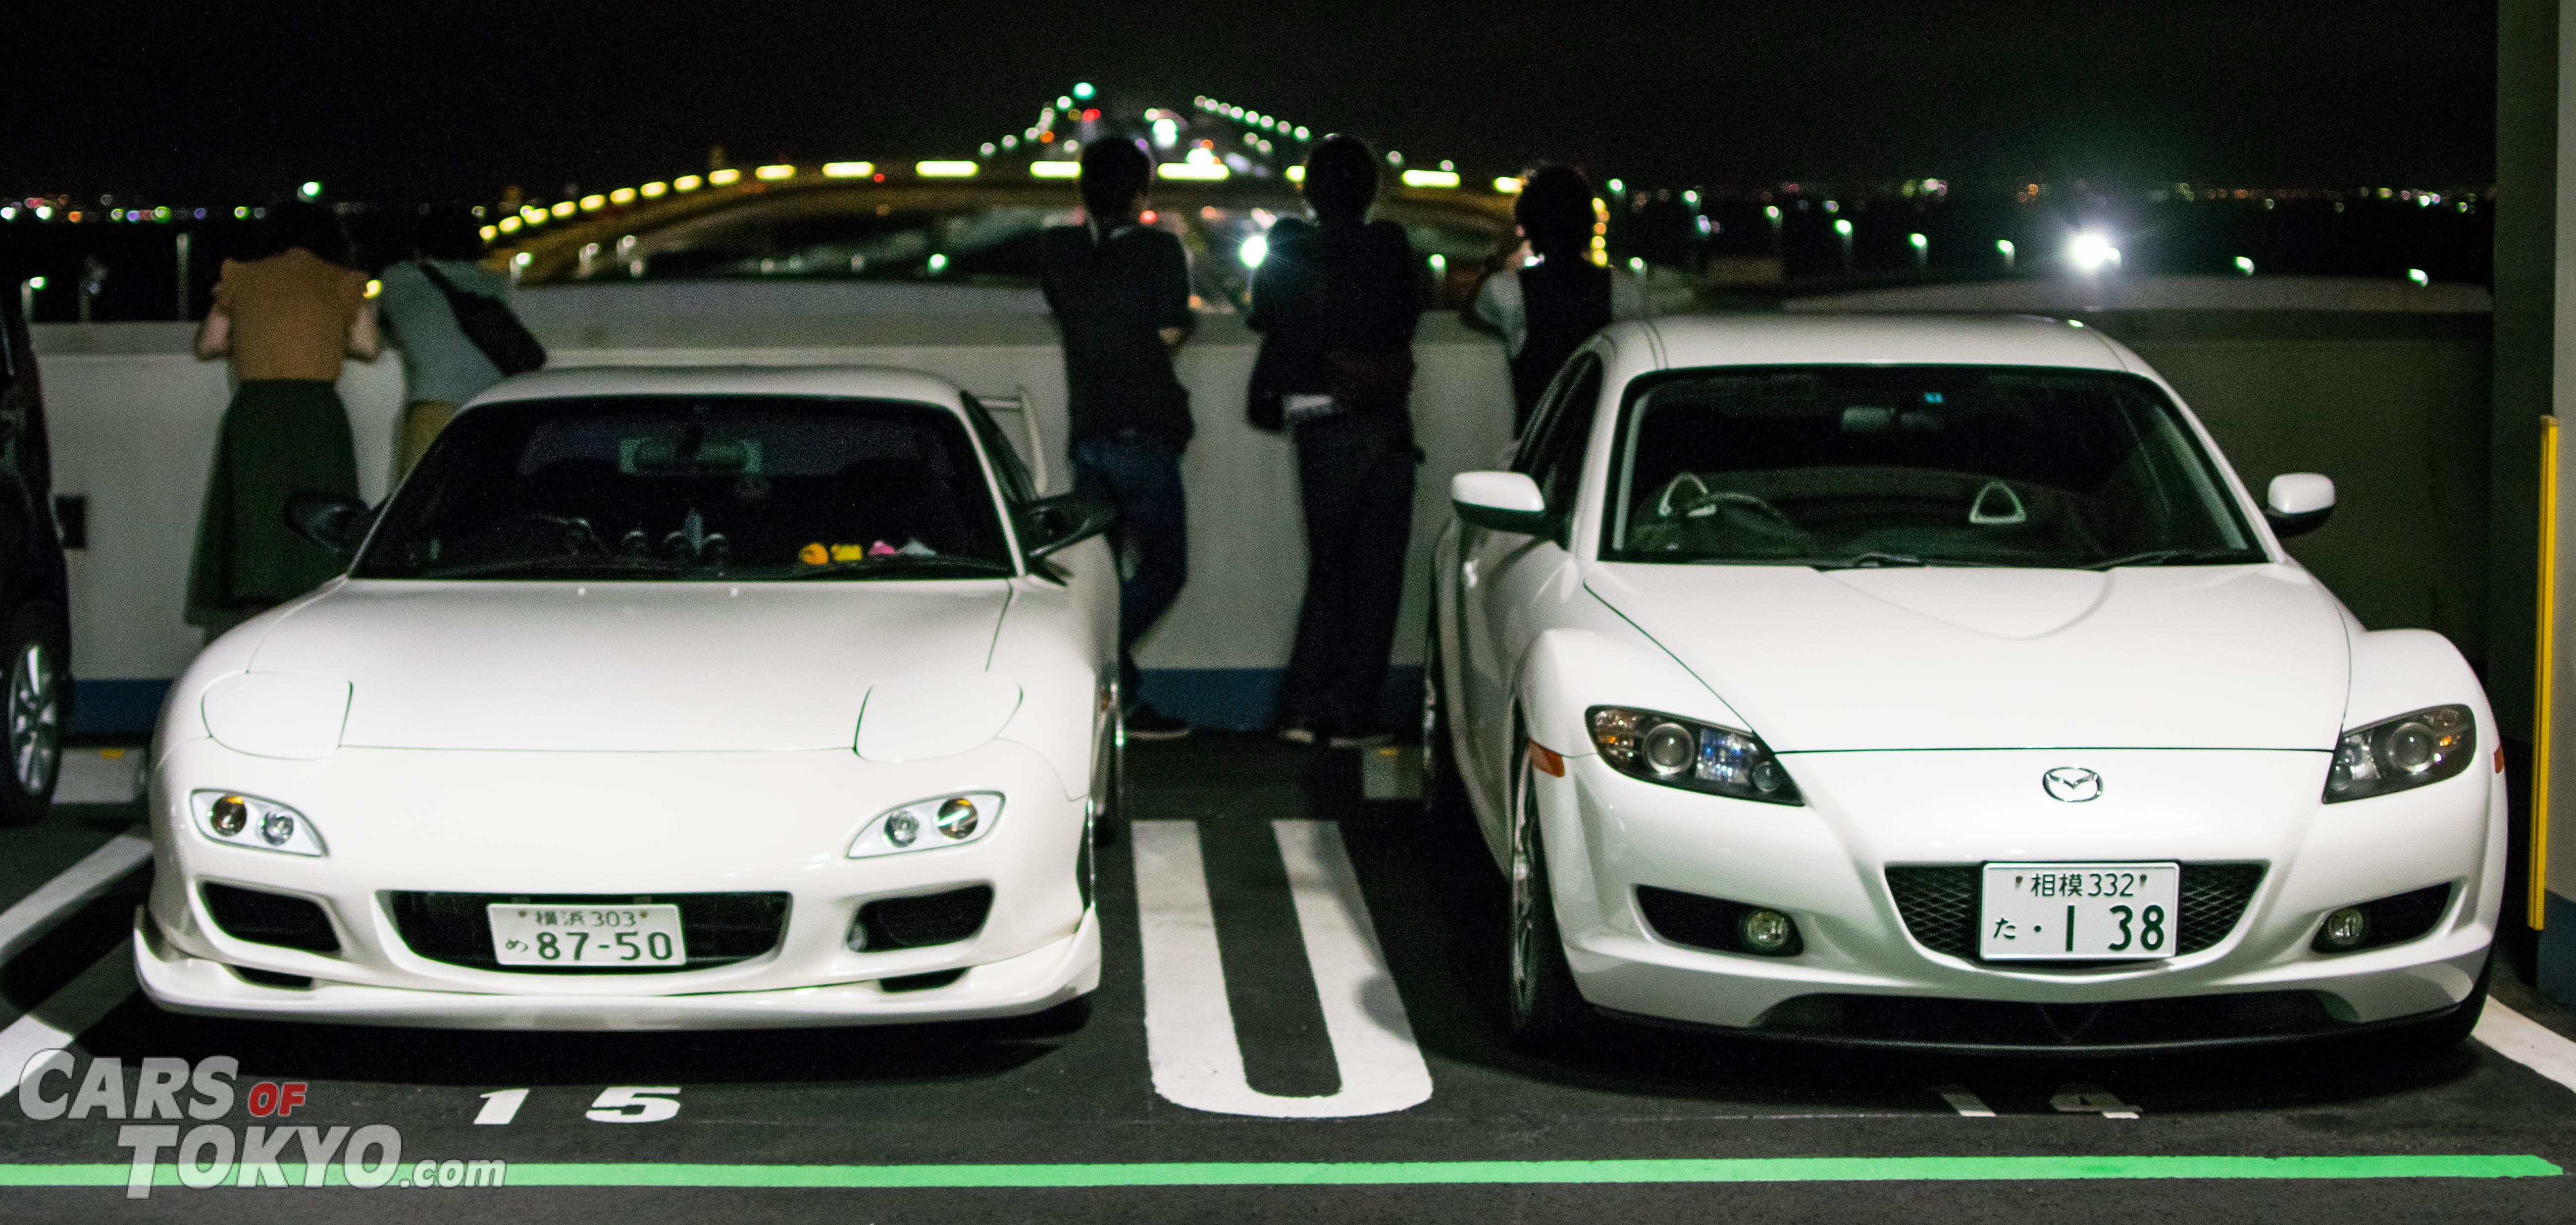 Cars of Tokyo Mazda RX7 RX8